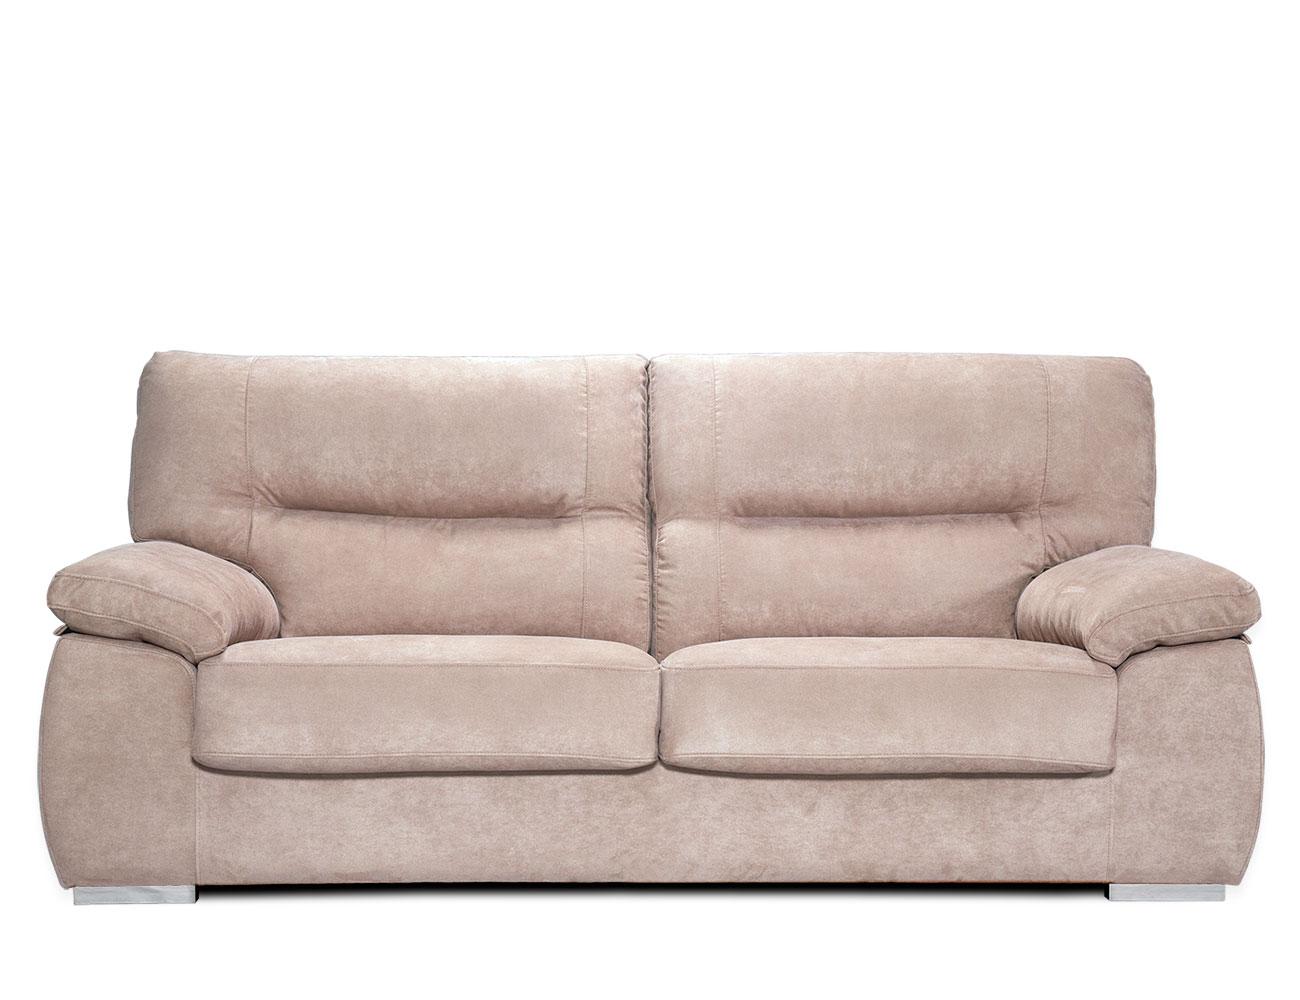 Sofa 3 plazas beige